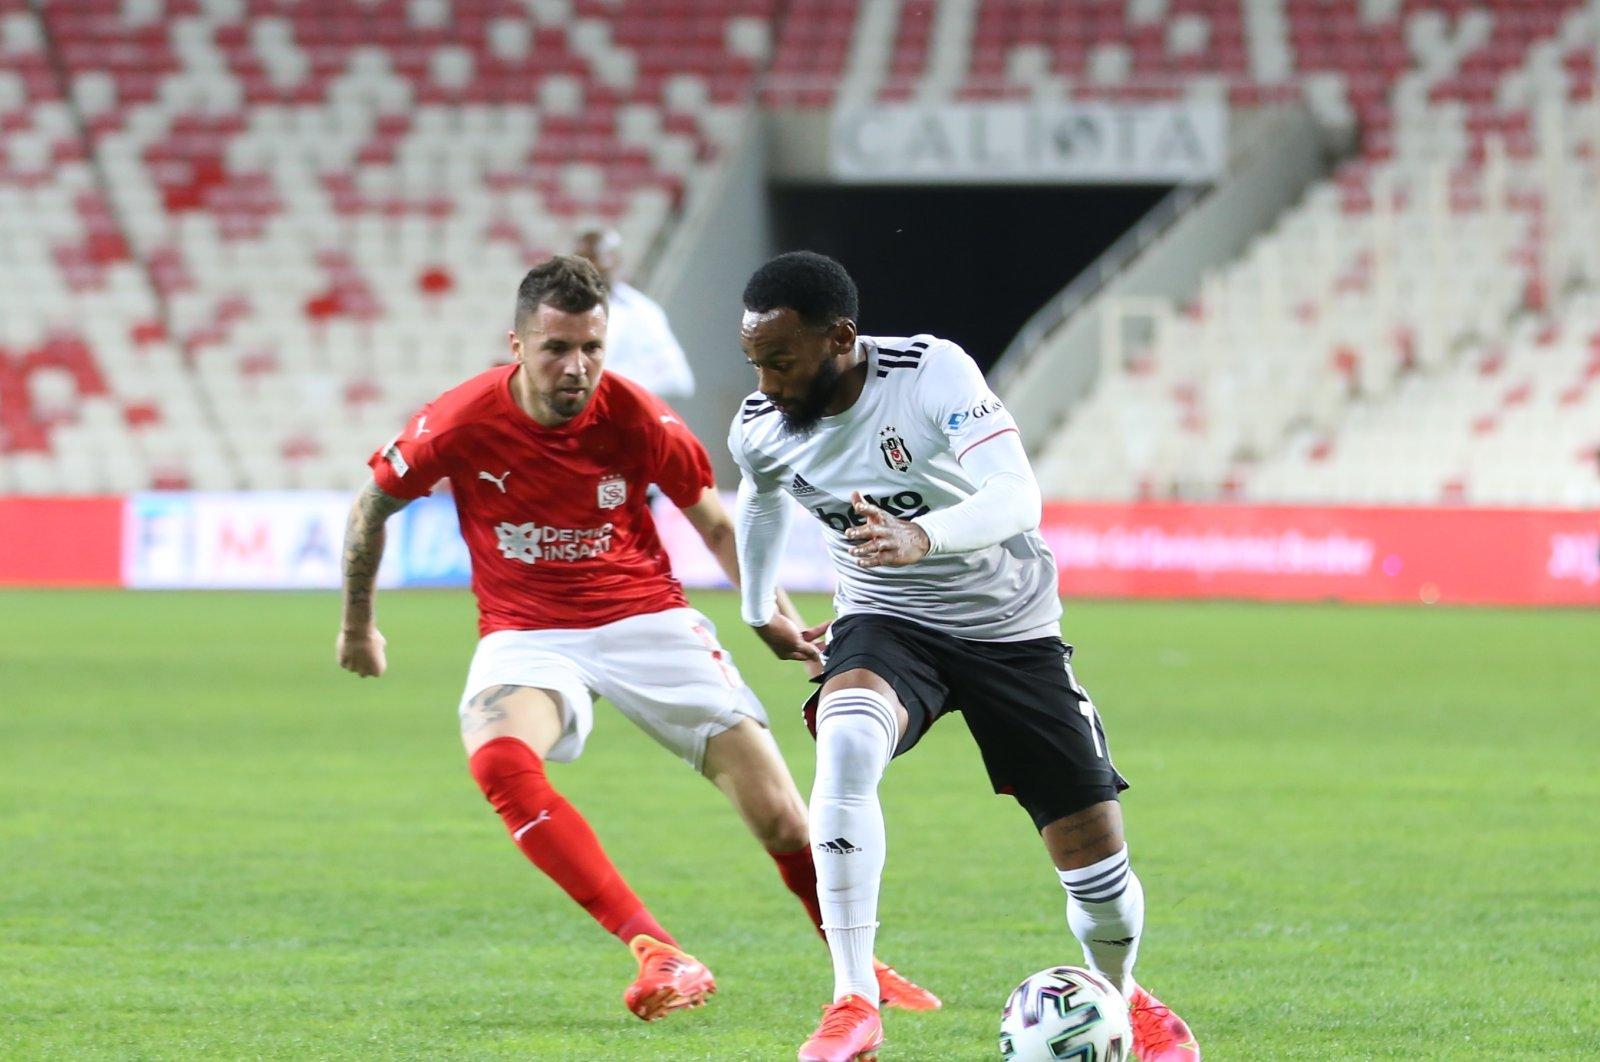 Sivasspor's Claudemir de Souza (L) and Beşiktaş's Kevin N'Koudou vie for the ball during a Süper Lig match at the Yeni 4 Eylül Stadium in Sivas, Turkey, April 20, 2021. (AA Photo)